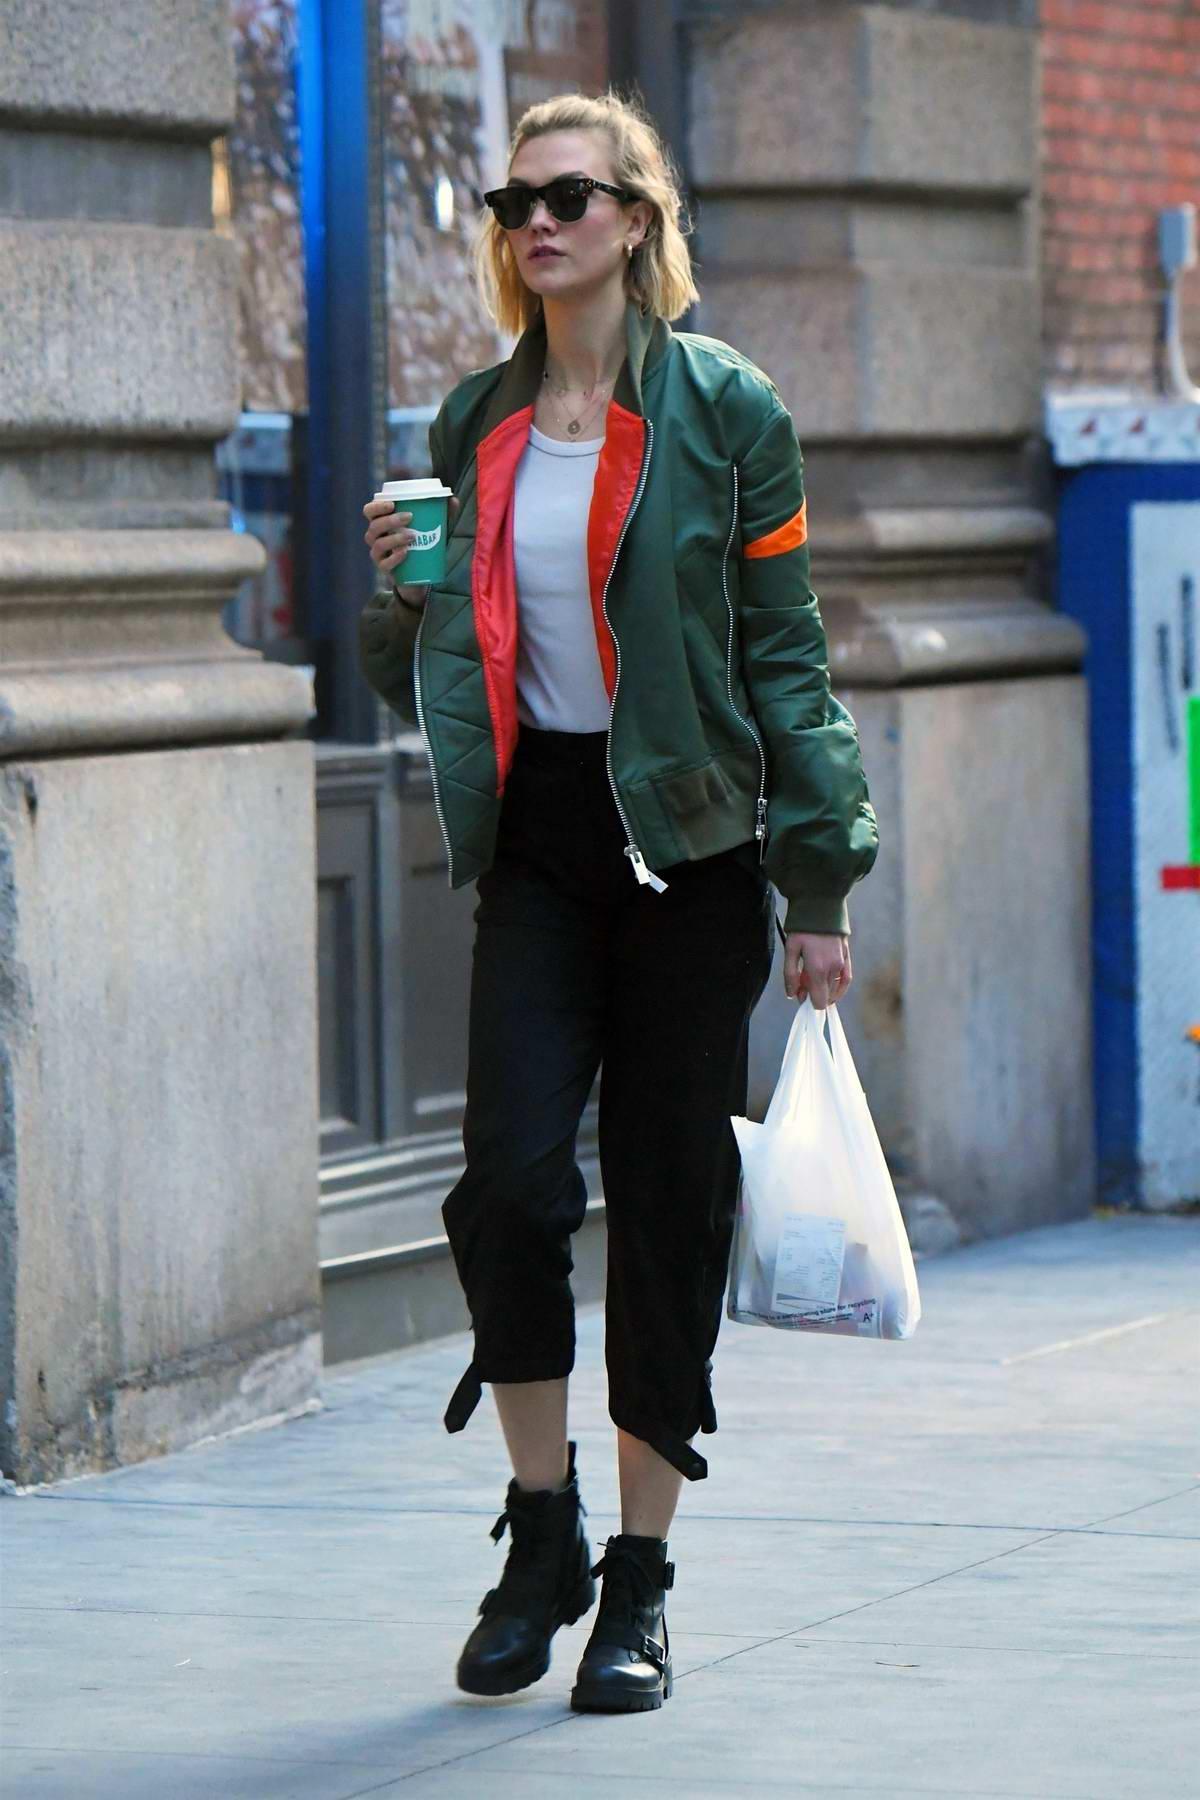 Karlie Kloss steps out for a food run at Dig Inn Restaurant in Soho, New York City